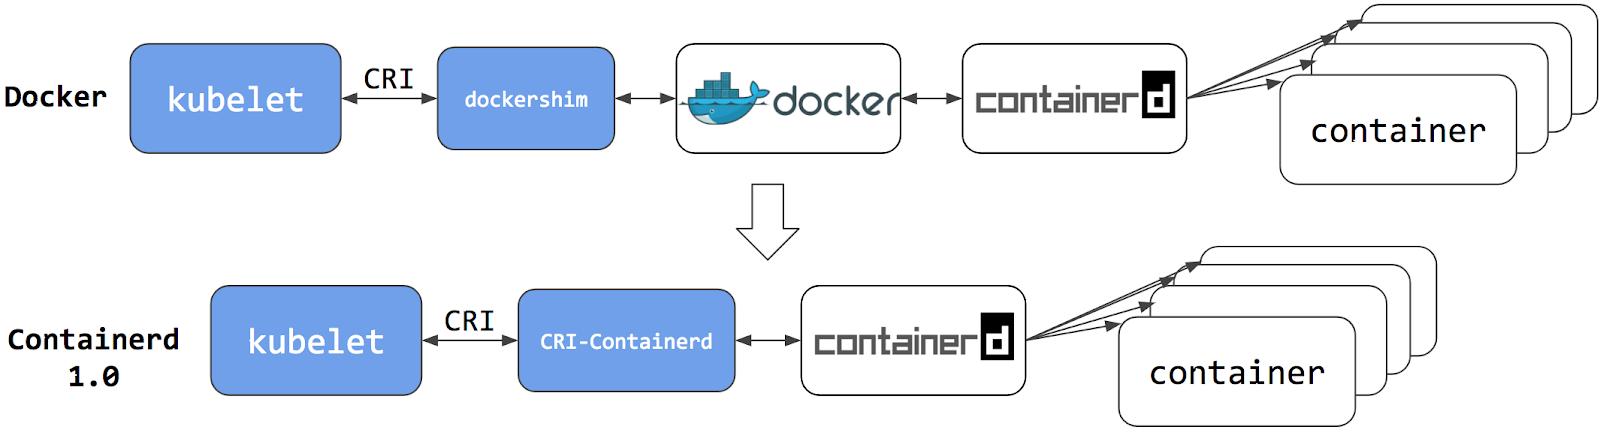 cri-containerd.png